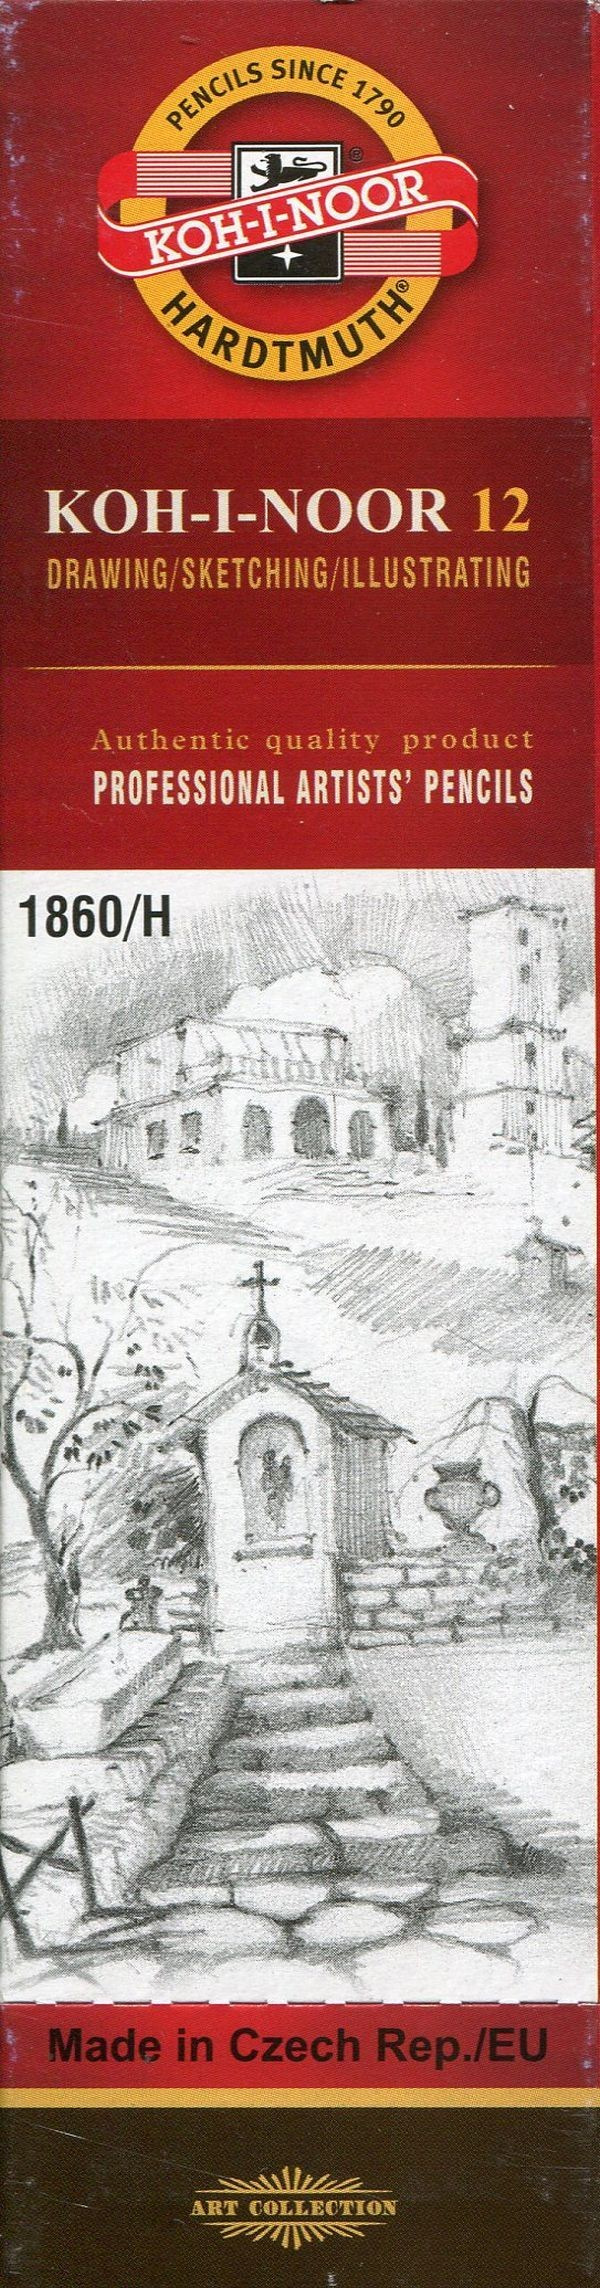 Koh-I-Noor Koh-I-Noor Ołówek grafitowy 1860/H1 Gold Star 12 szt